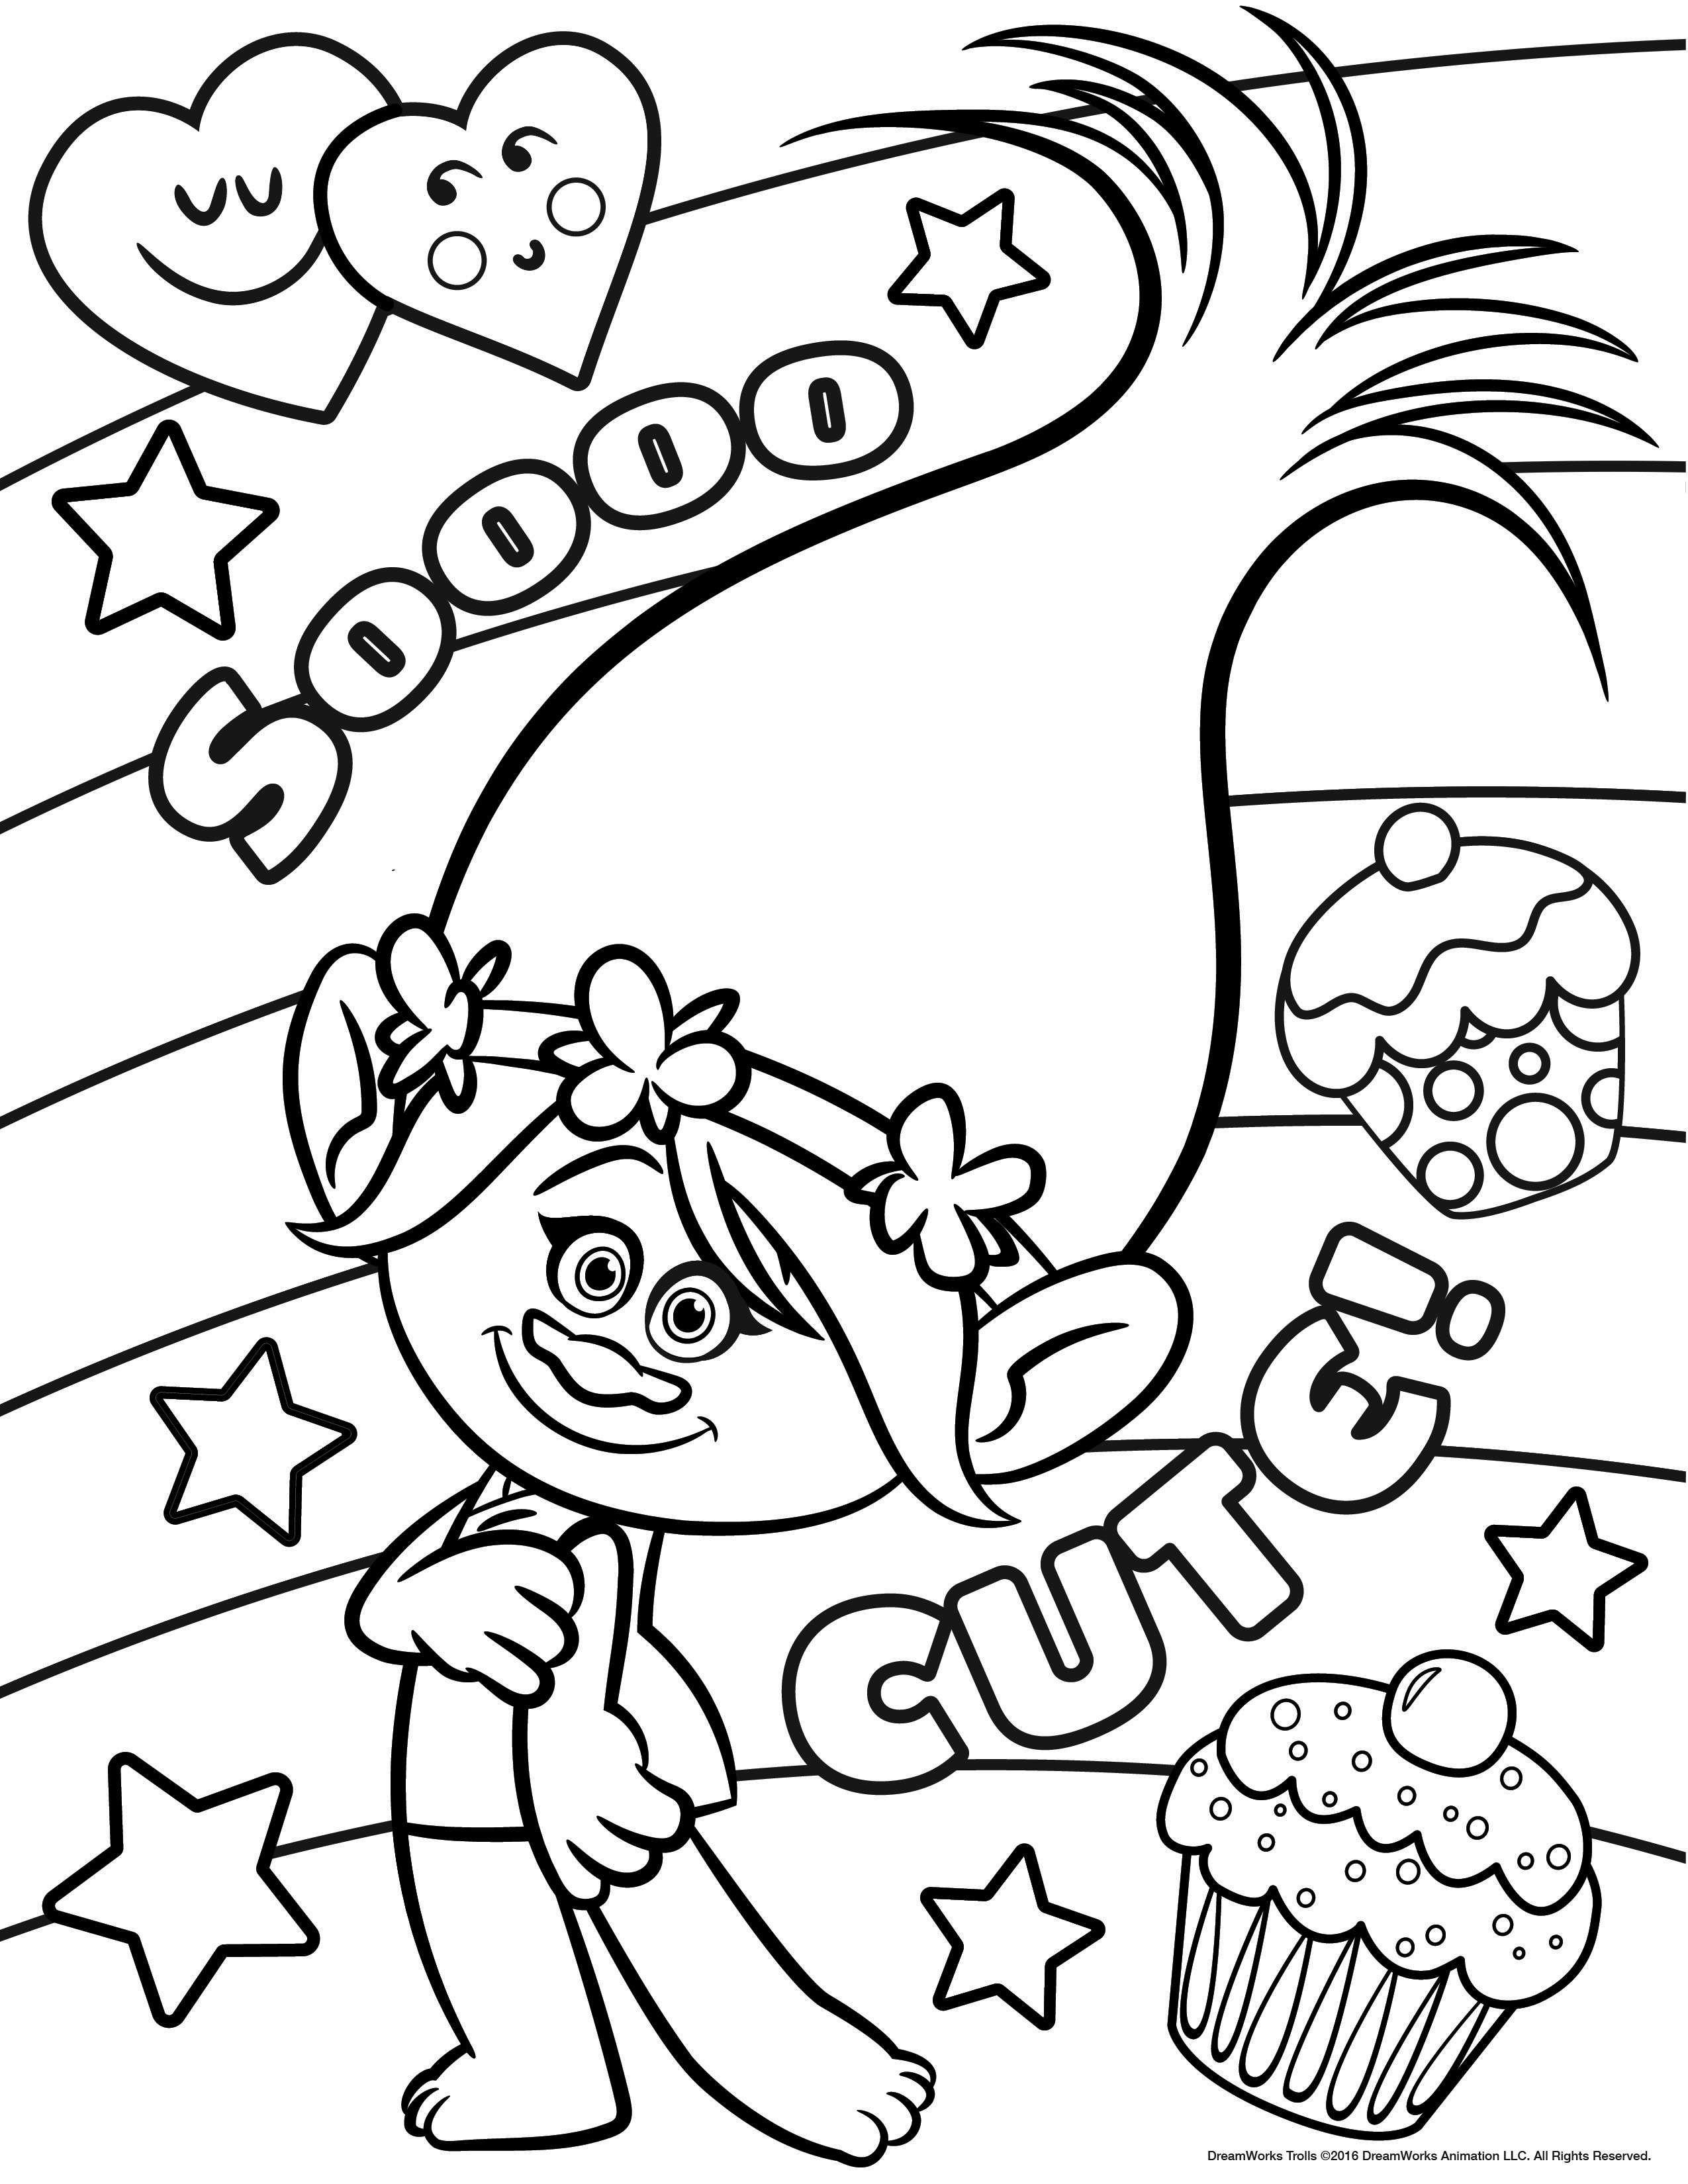 Afficher L Image D Origine Free Disney Coloring Pages Poppy Coloring Page Disney Coloring Pages